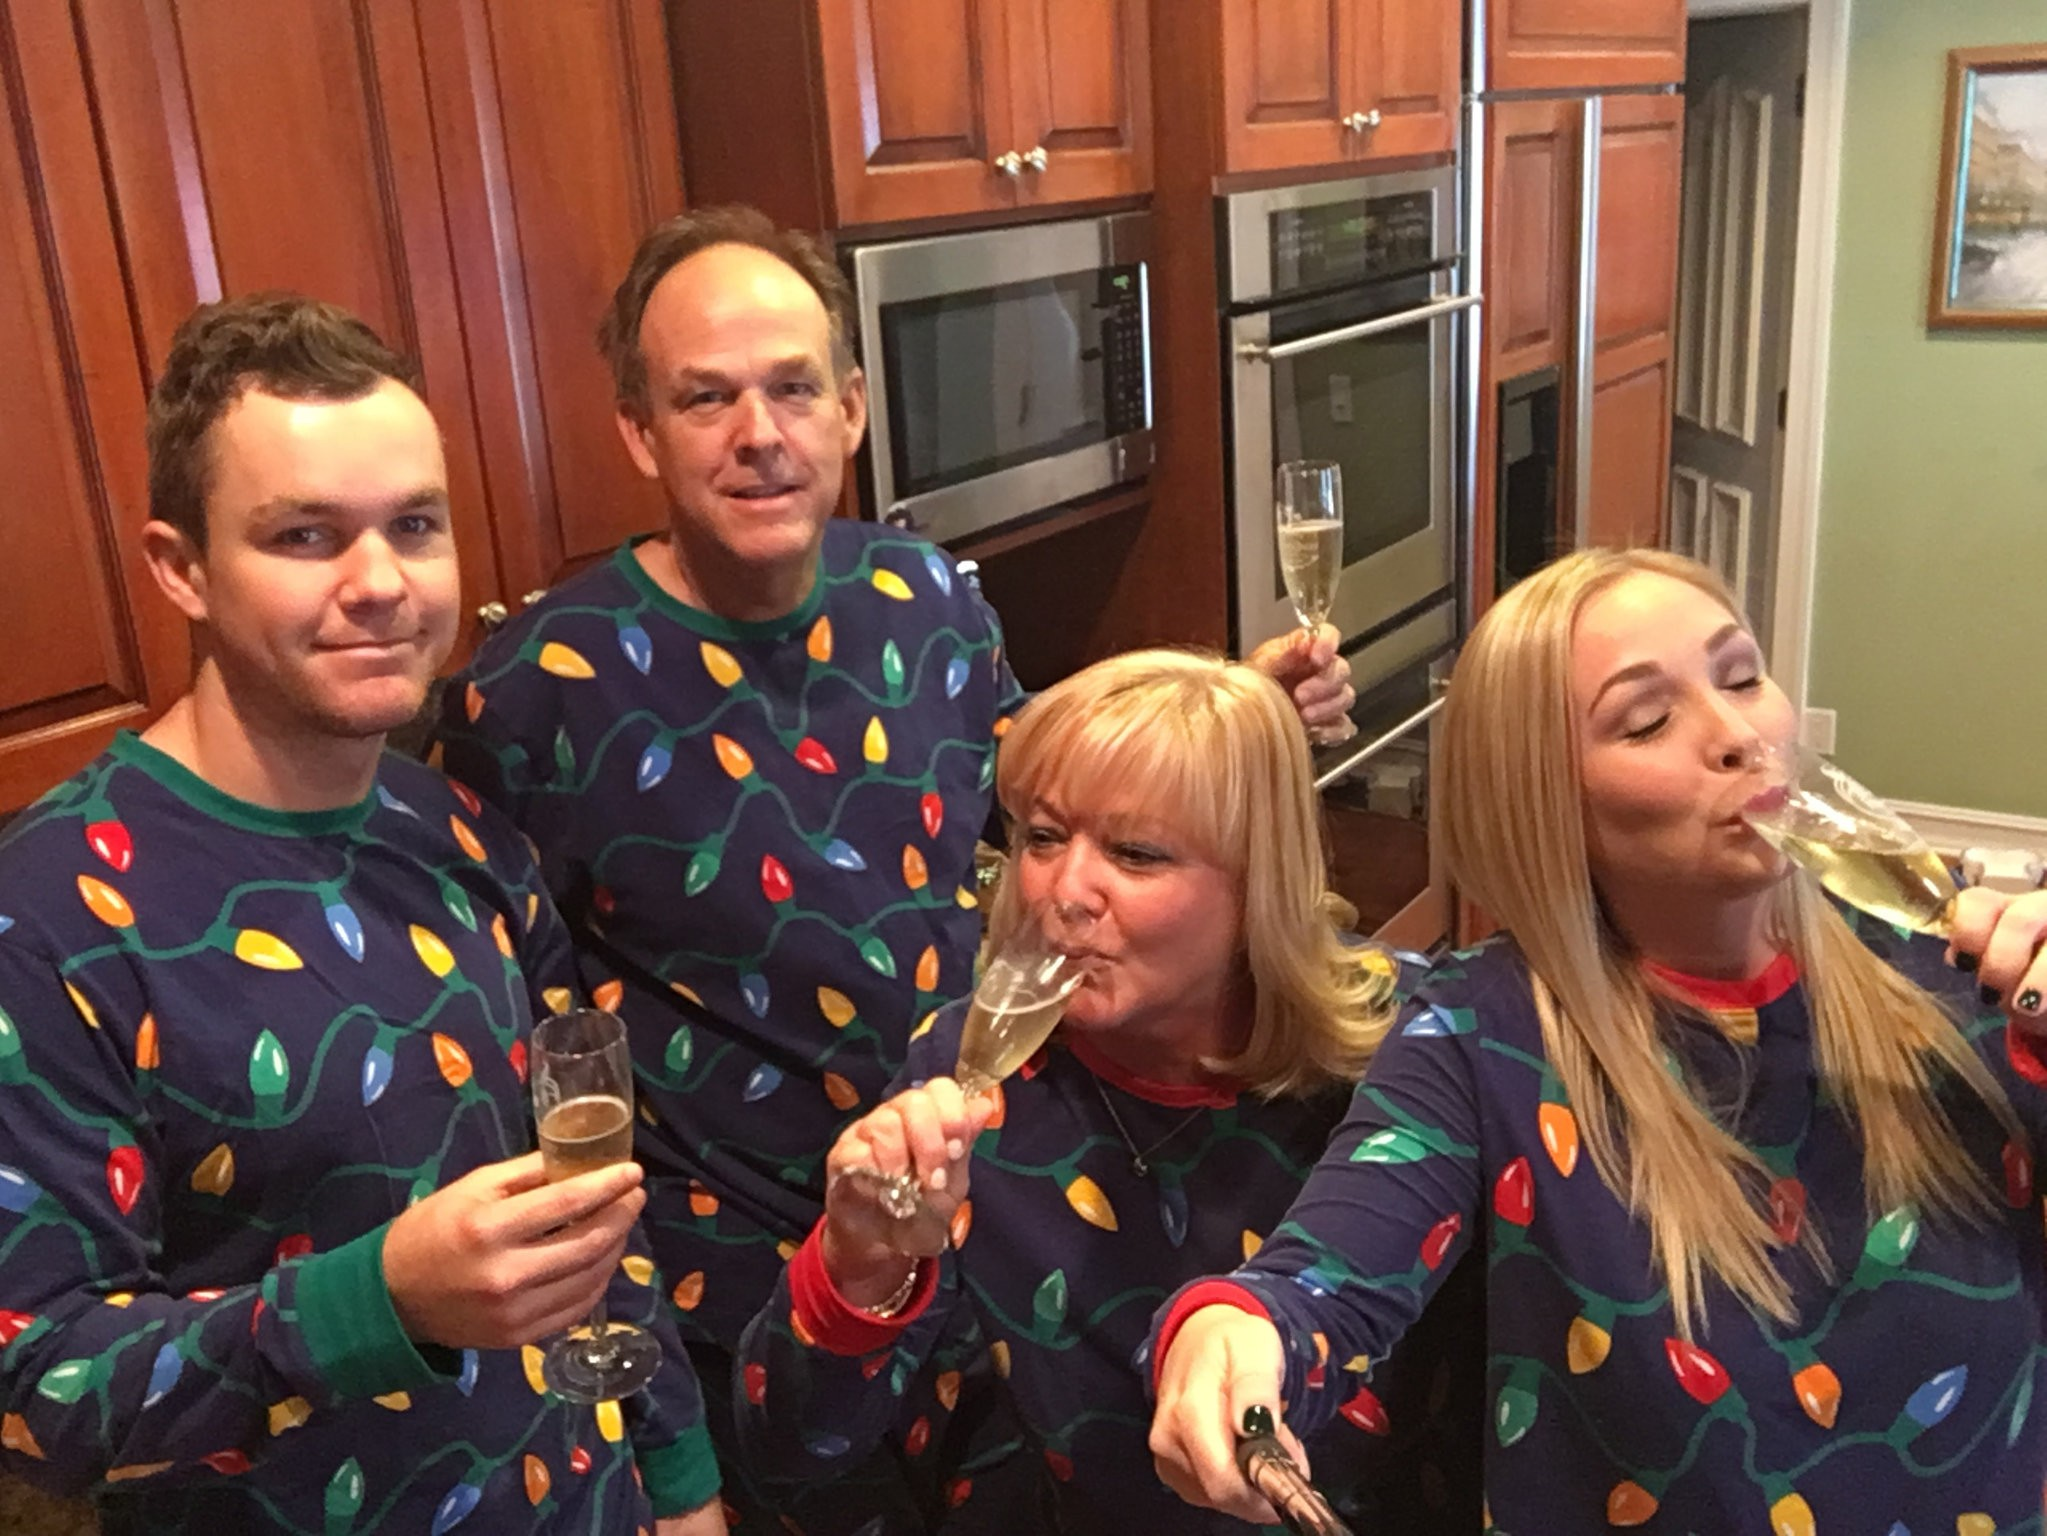 Family Christmas Pajamas Photoshoot.Matching Family Pajamas Are The New Ugly Christmas Sweaters